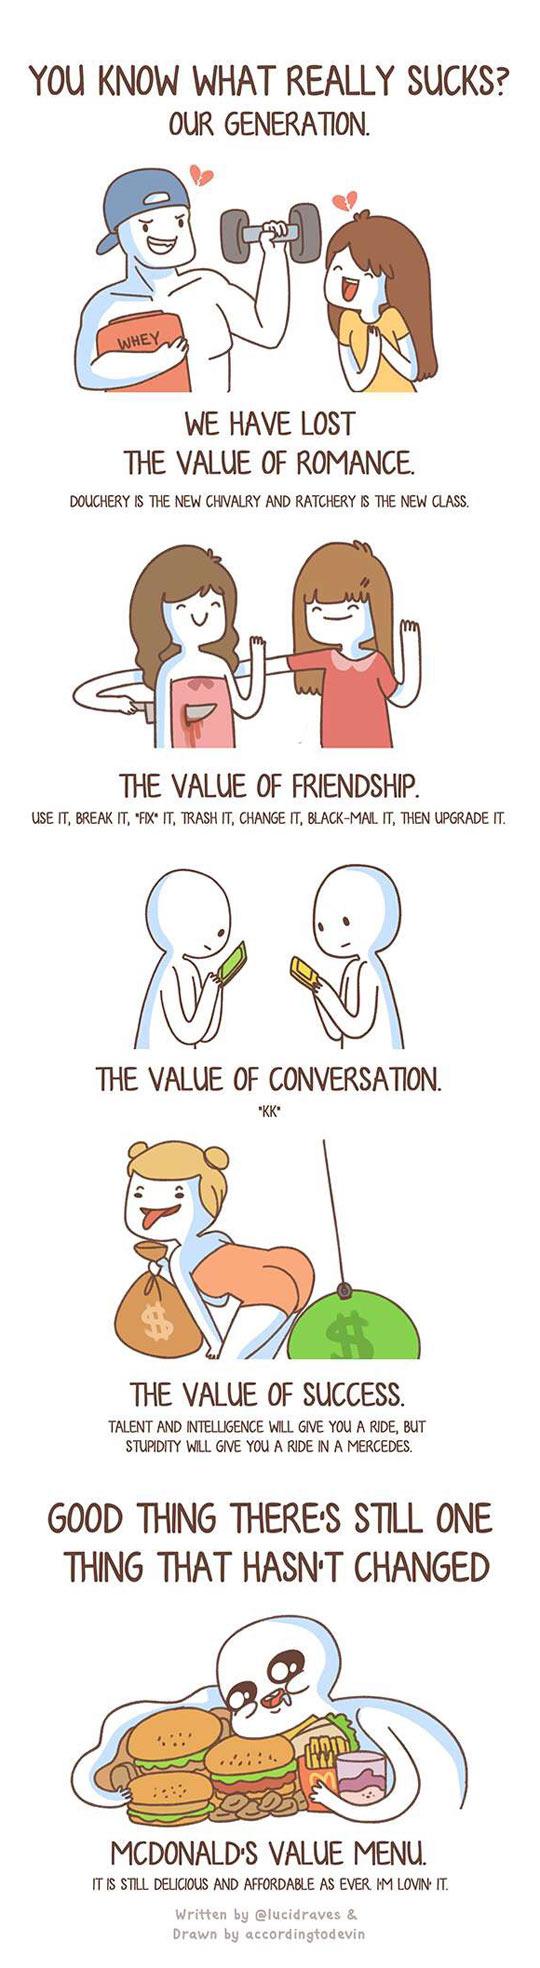 funny-romance-friendship-generation-conversation